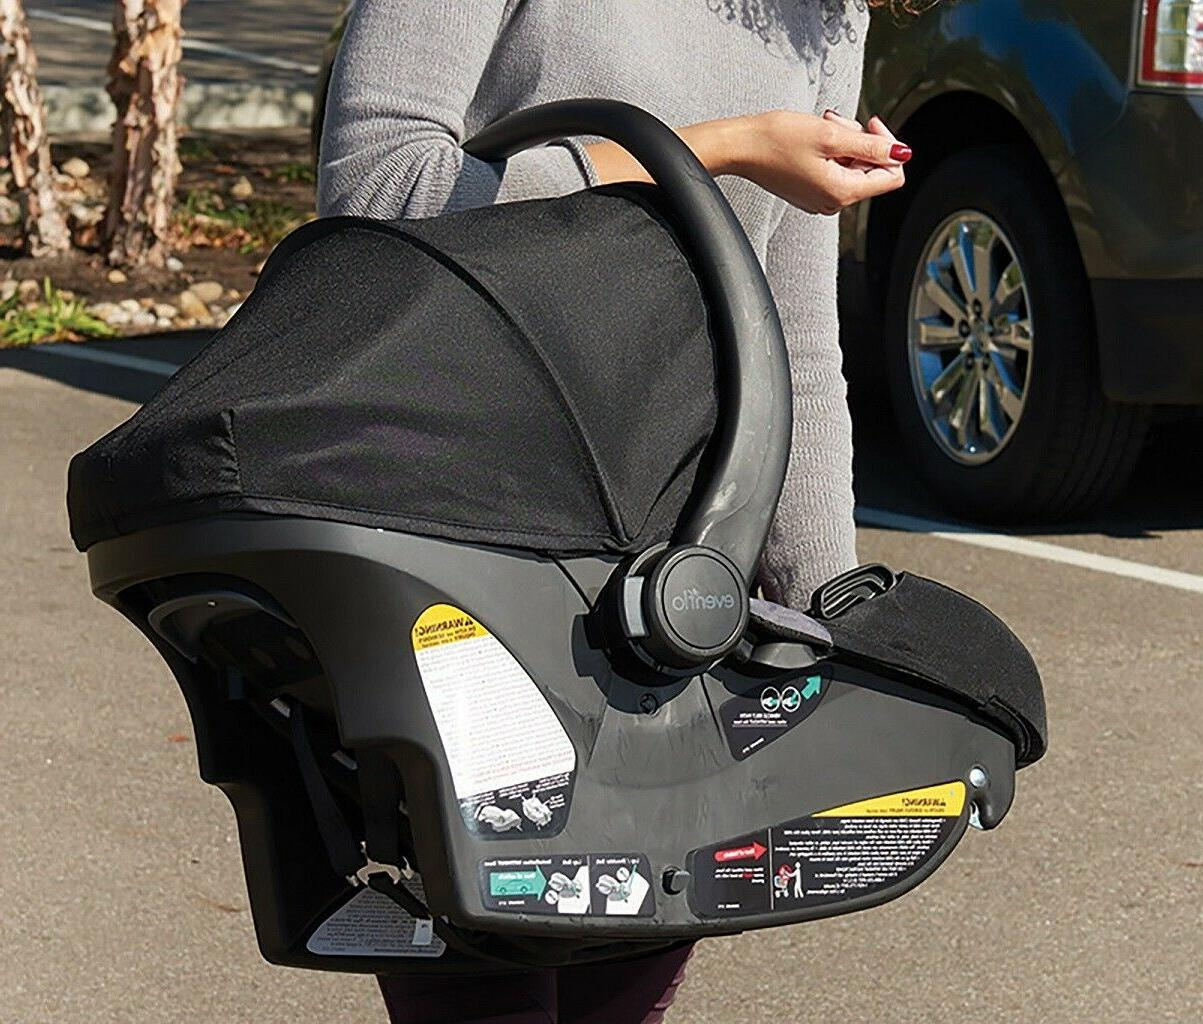 Newborn with Car Seat Combo Playard Swing Bag System